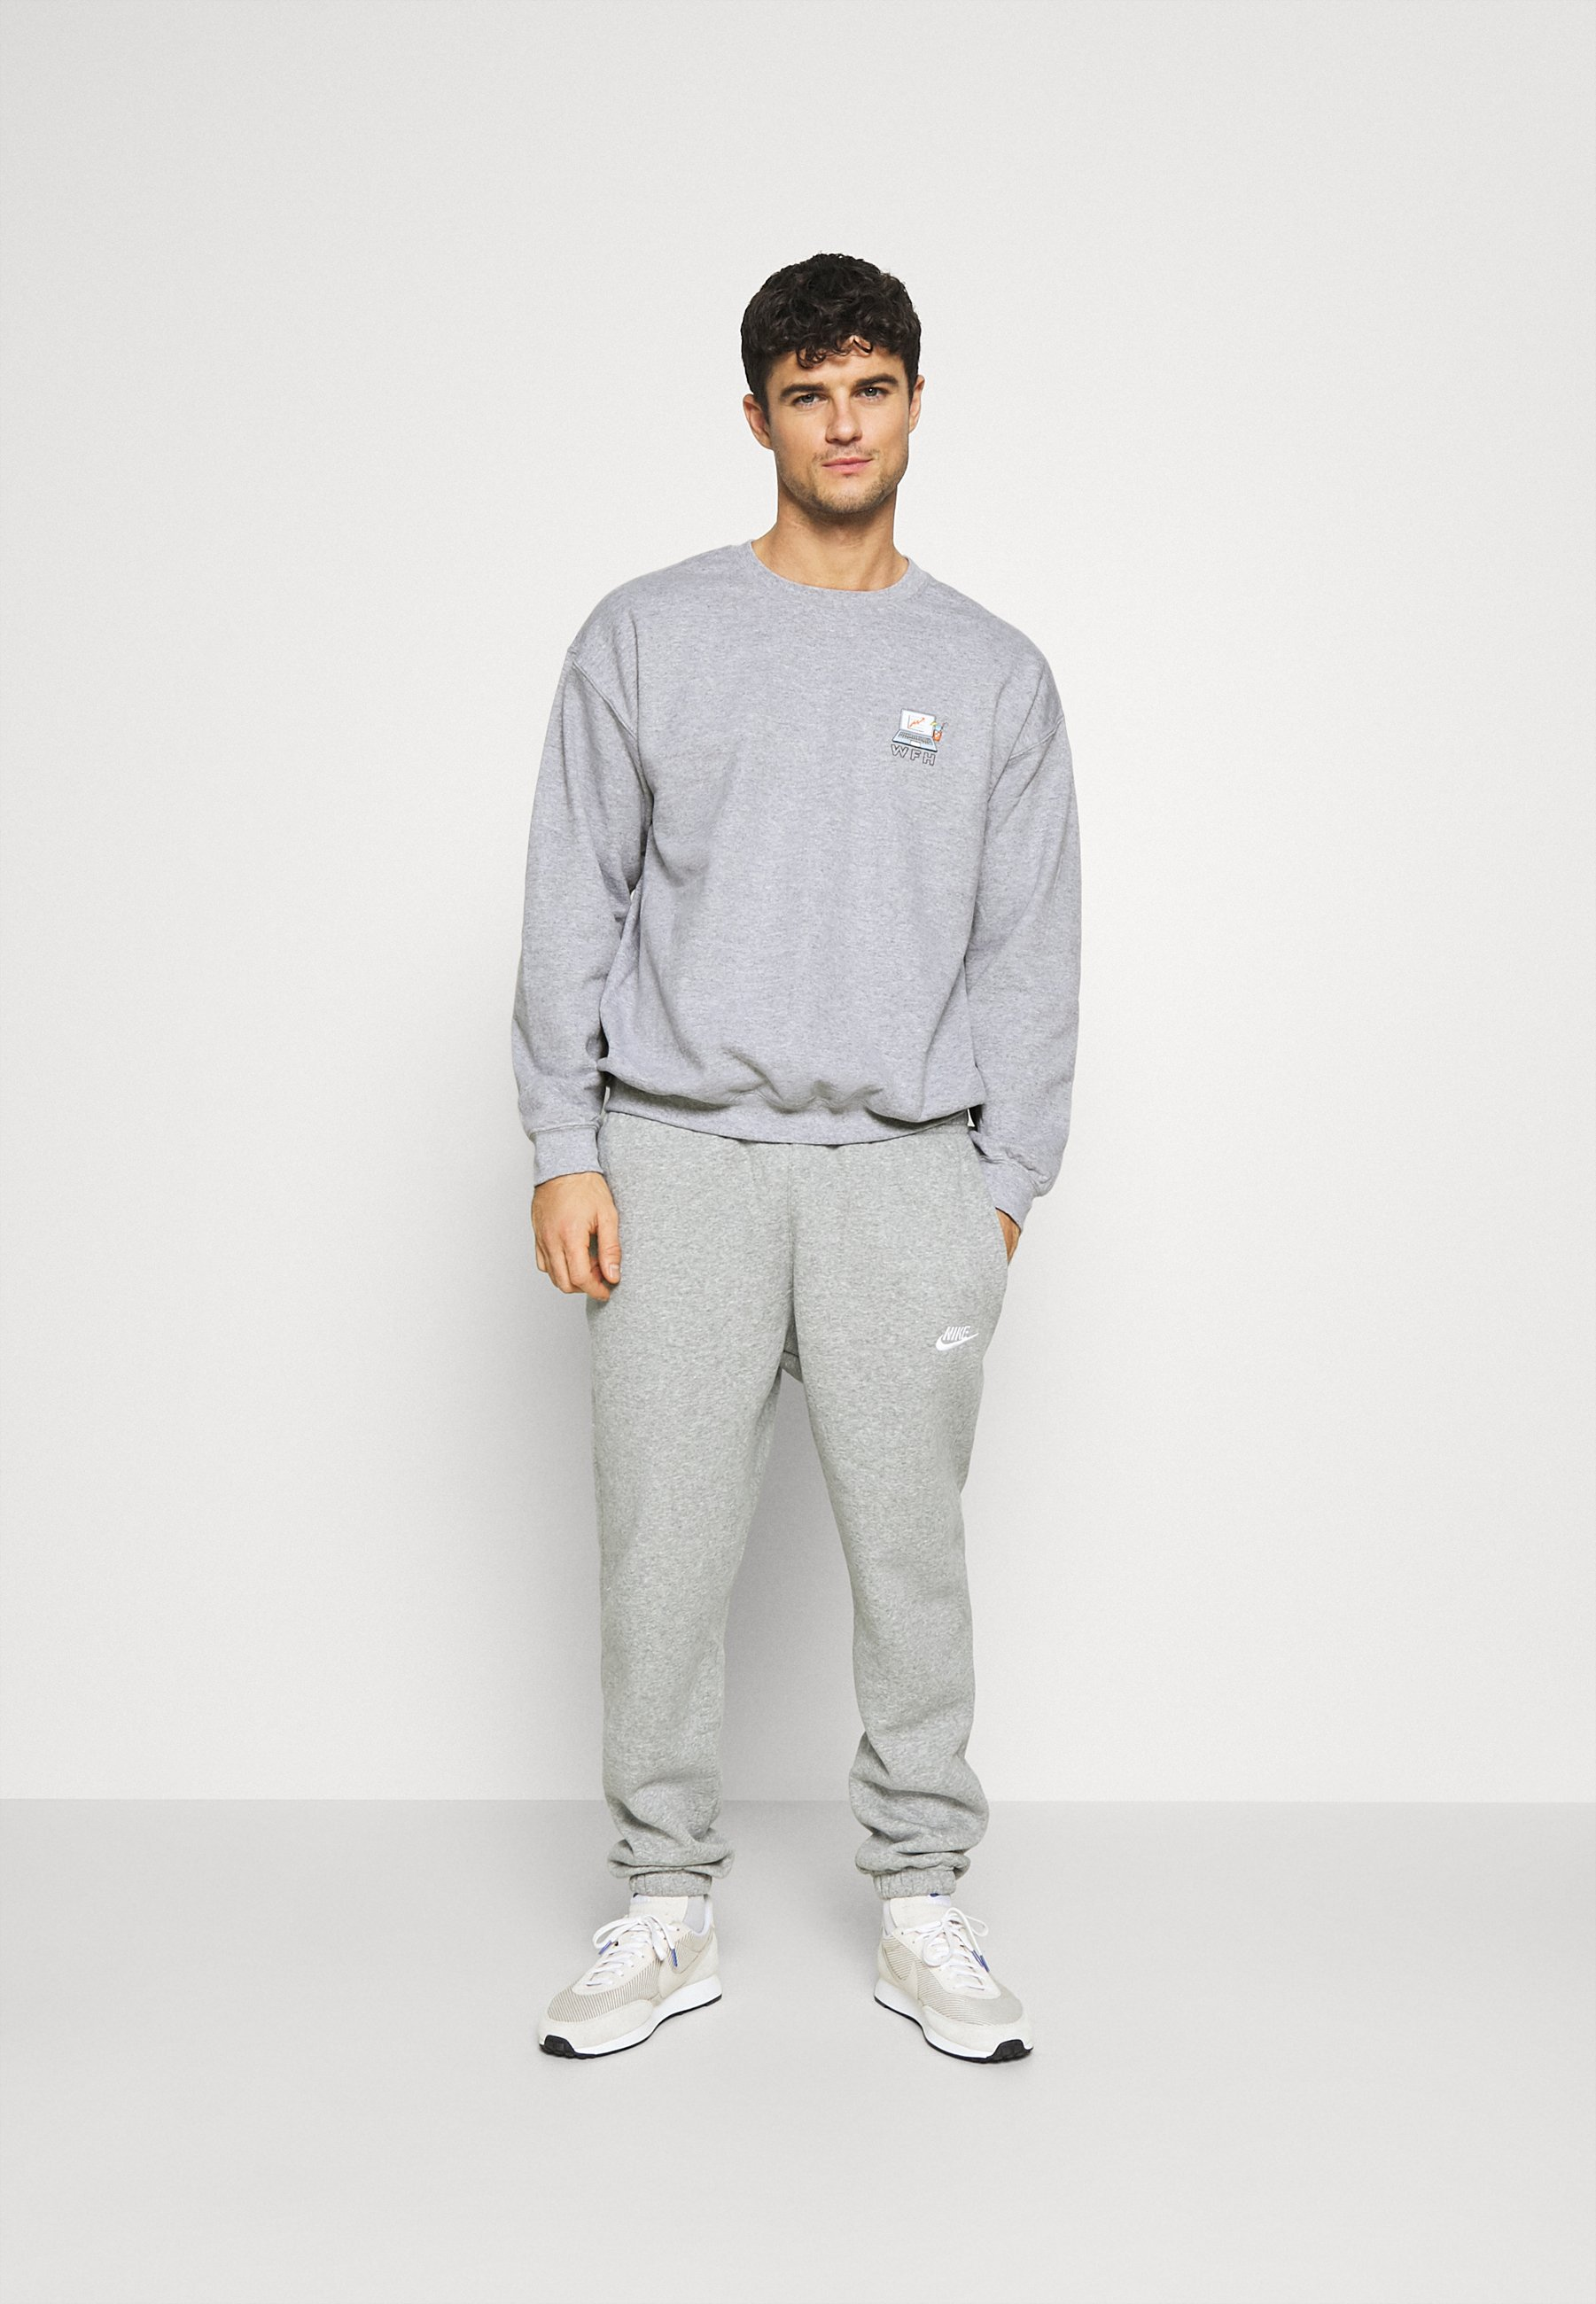 Topman Sweatshirt - Grey/grå